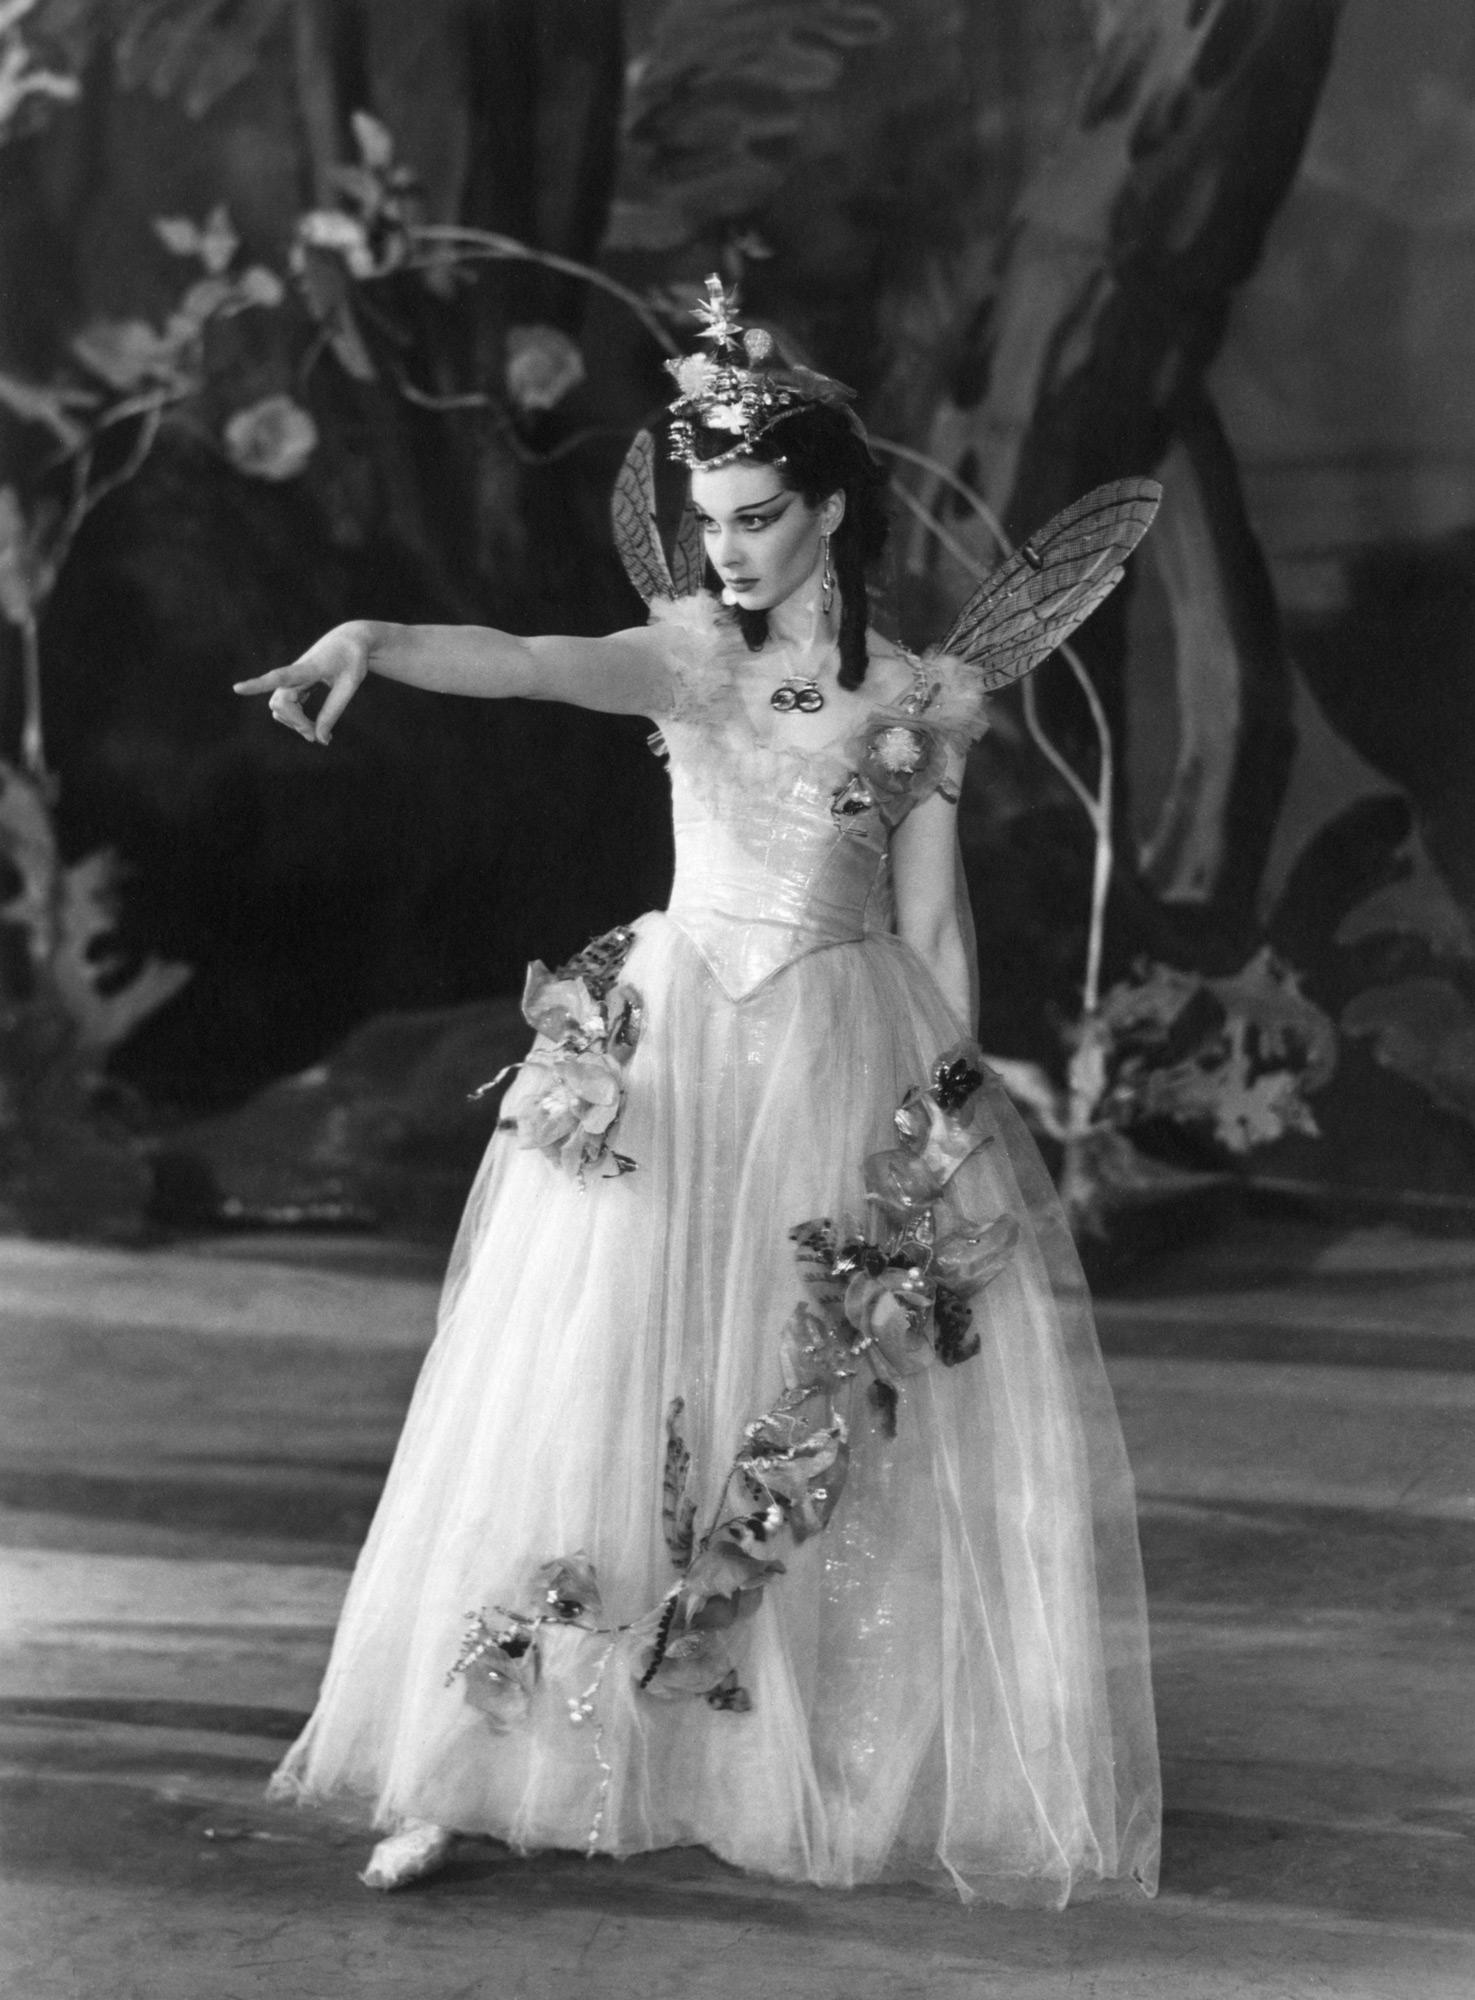 Photograph of Vivien Leigh as Titania from A Midsummer Night's Dream